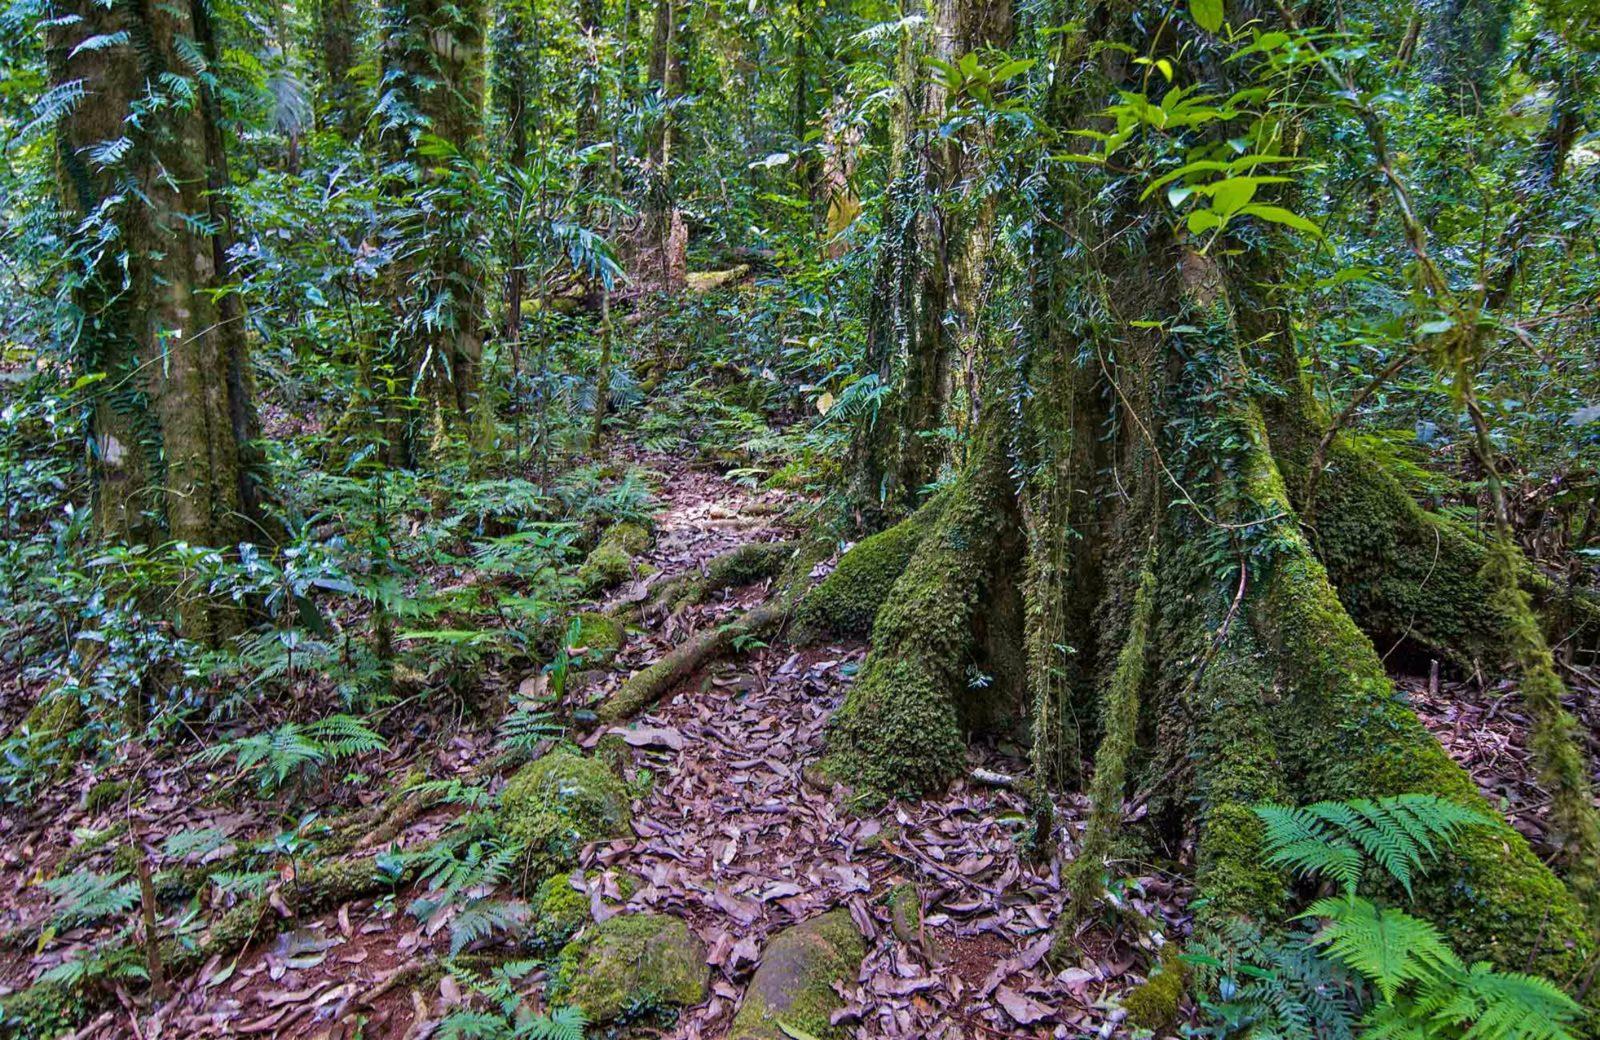 Helmholtzia loop walking track, Border Ranges National Park. Photo: John Spencer